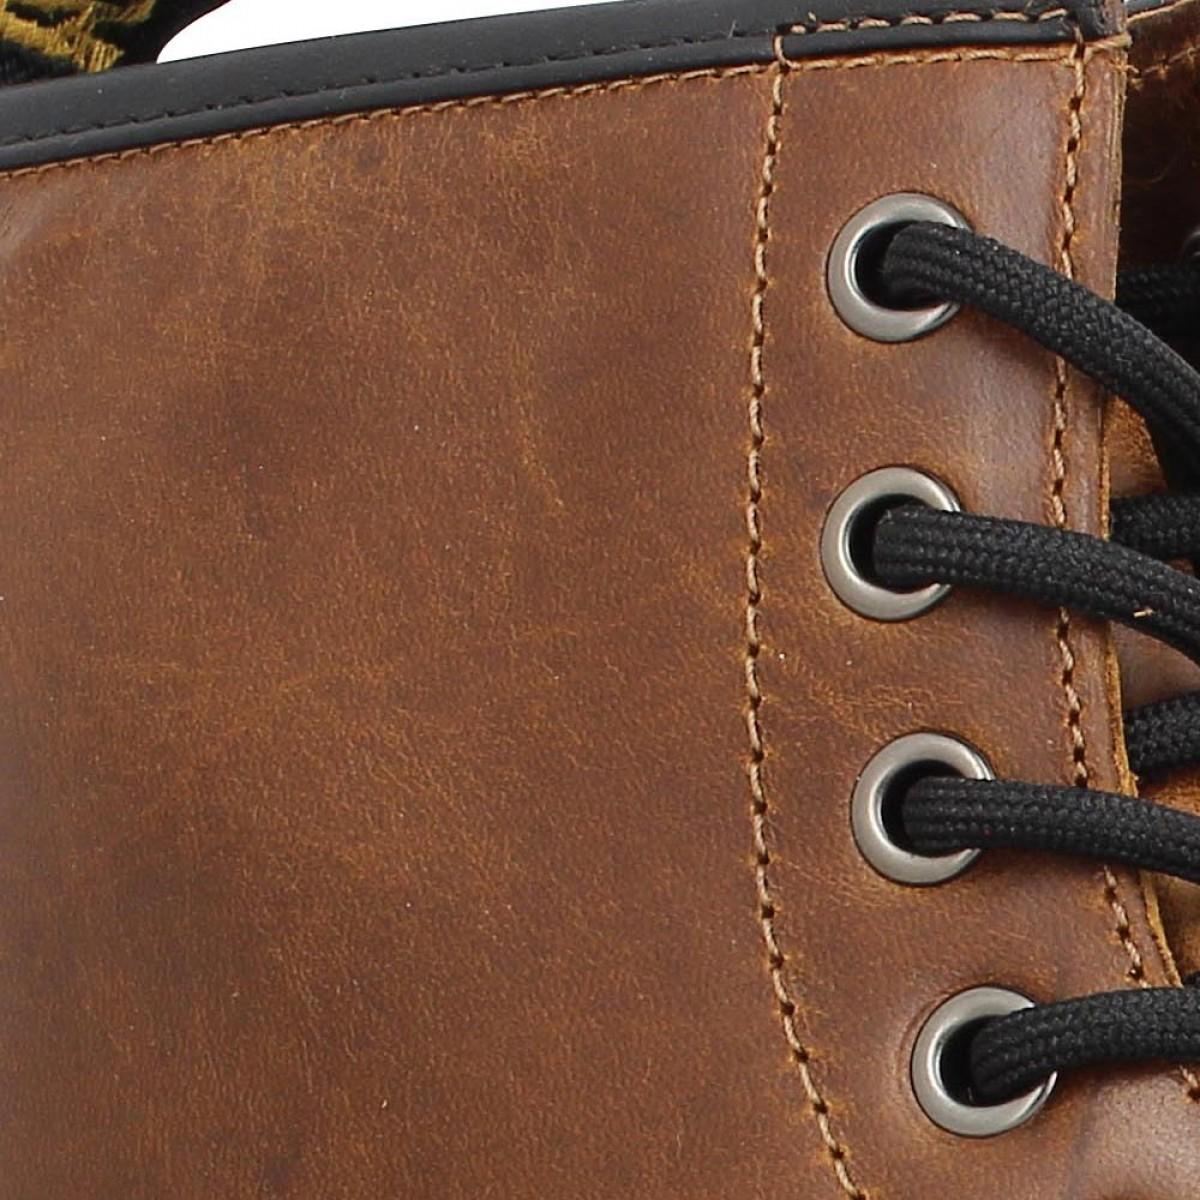 1460 homme martens cuir butterscotch hommeFanny chaussures Dr fYbgyv76